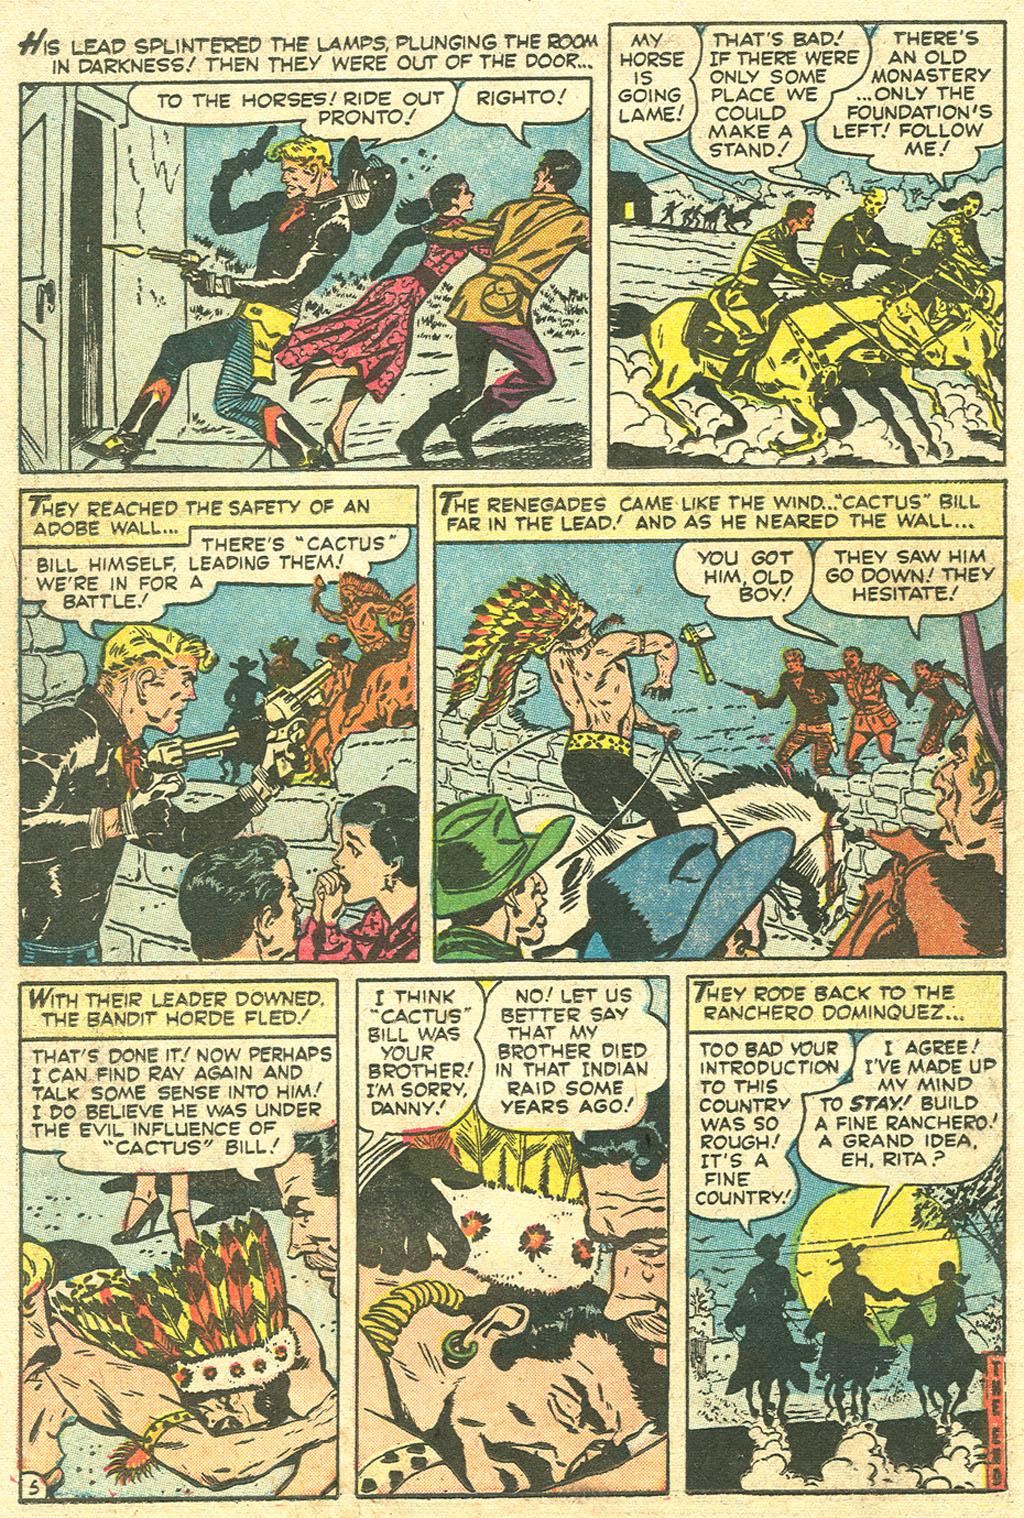 Read online Two-Gun Kid comic -  Issue #32 - 14